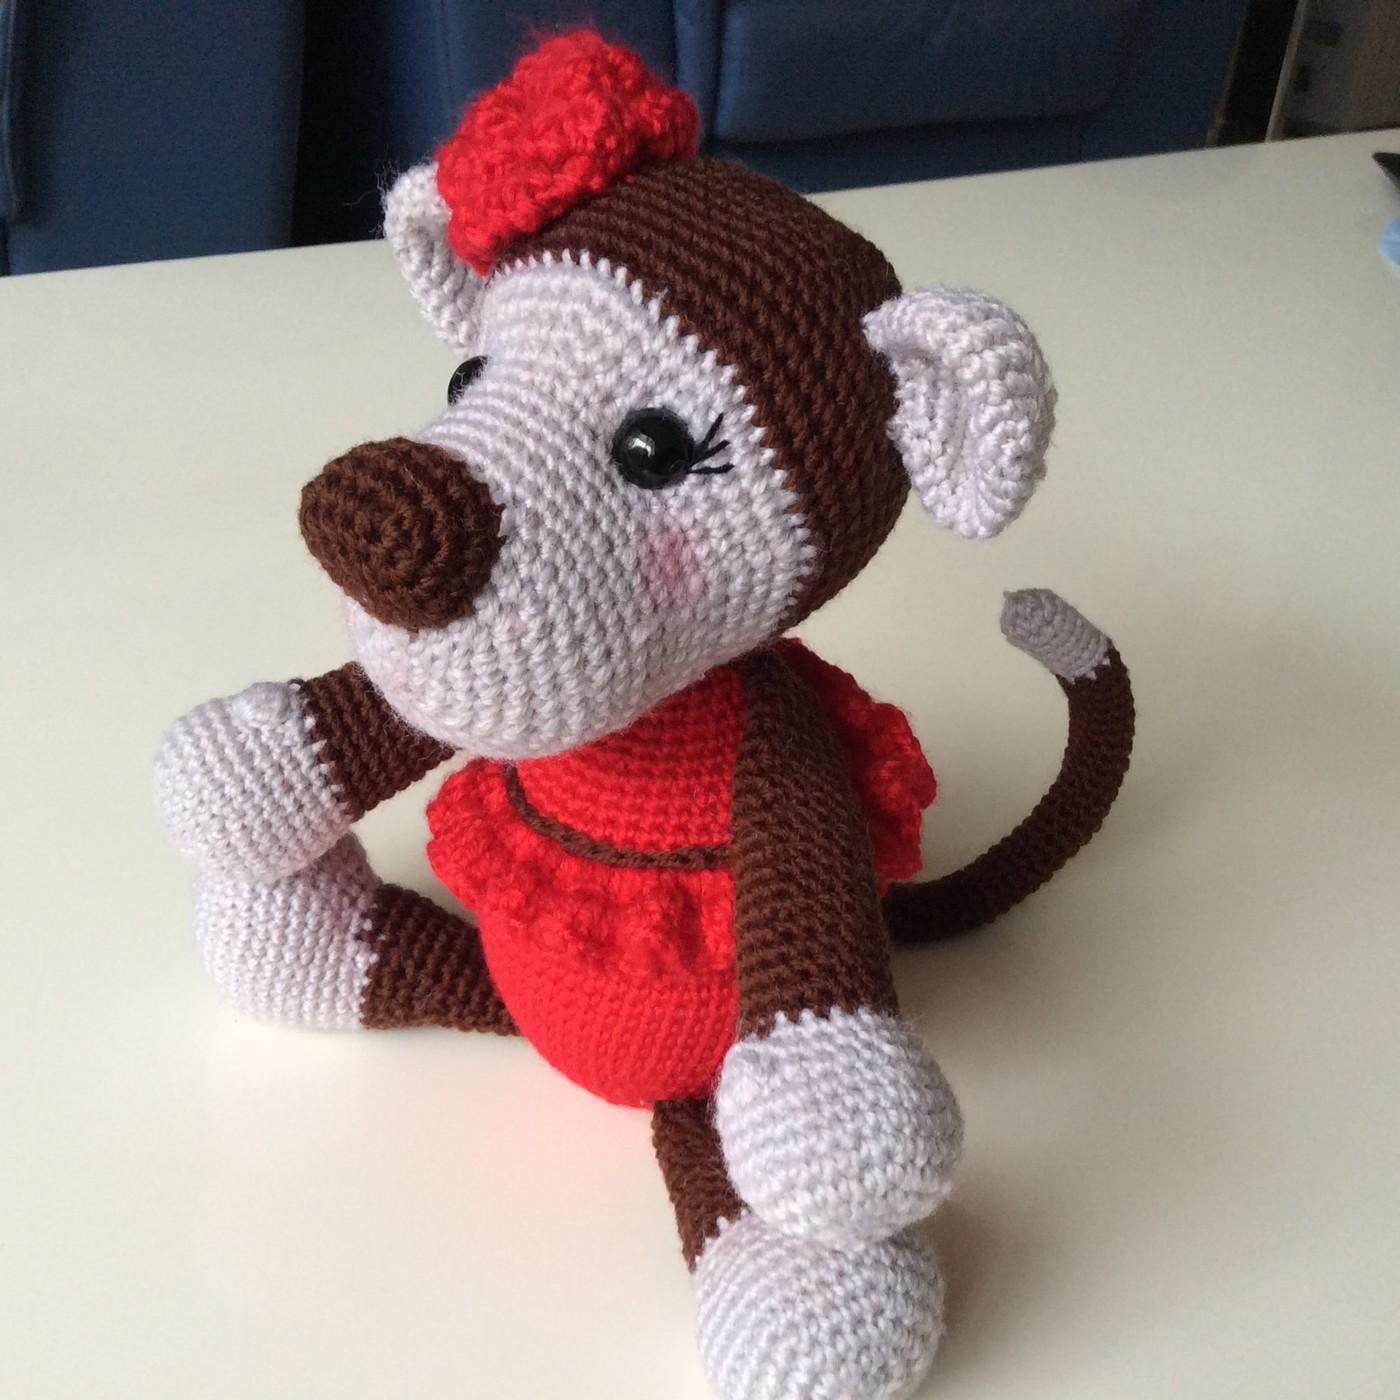 Monkey Crochet Crochet doll rattle Amigurumi|doll rattle|monkey ... | 1400x1400